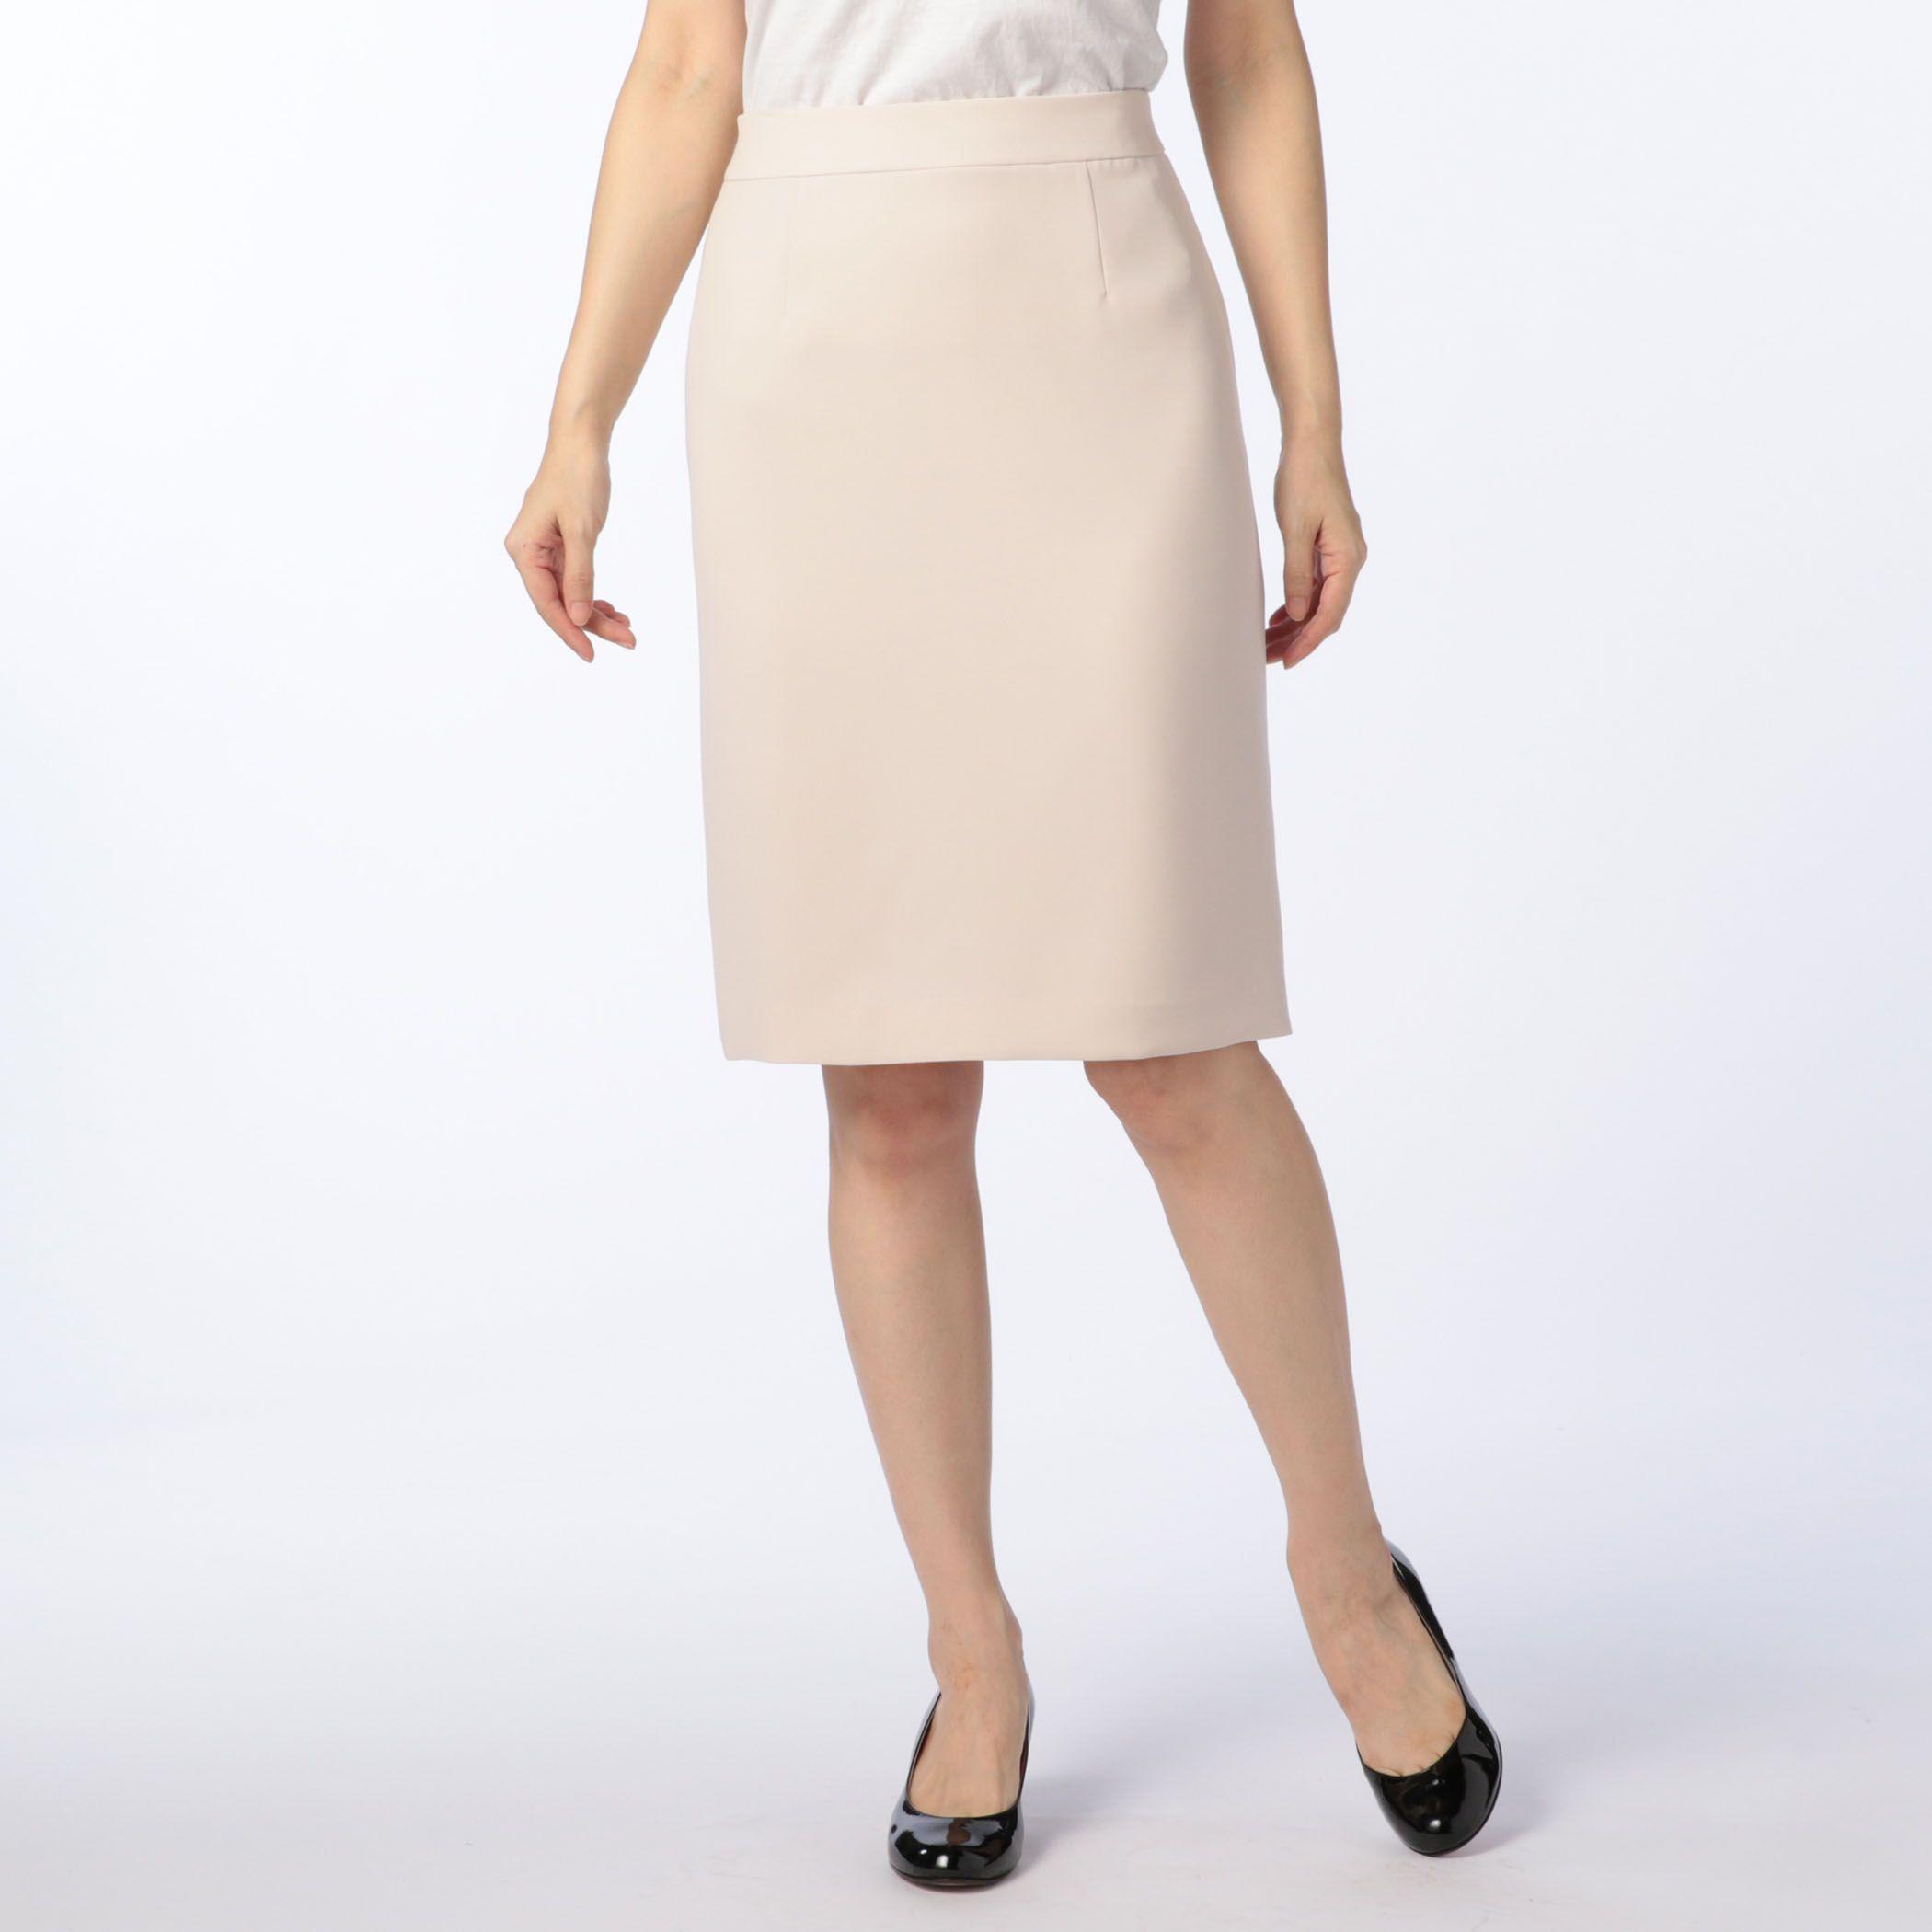 NOLLEY'Ssophiノーリーズソフィー/バックサテンタイトスカート